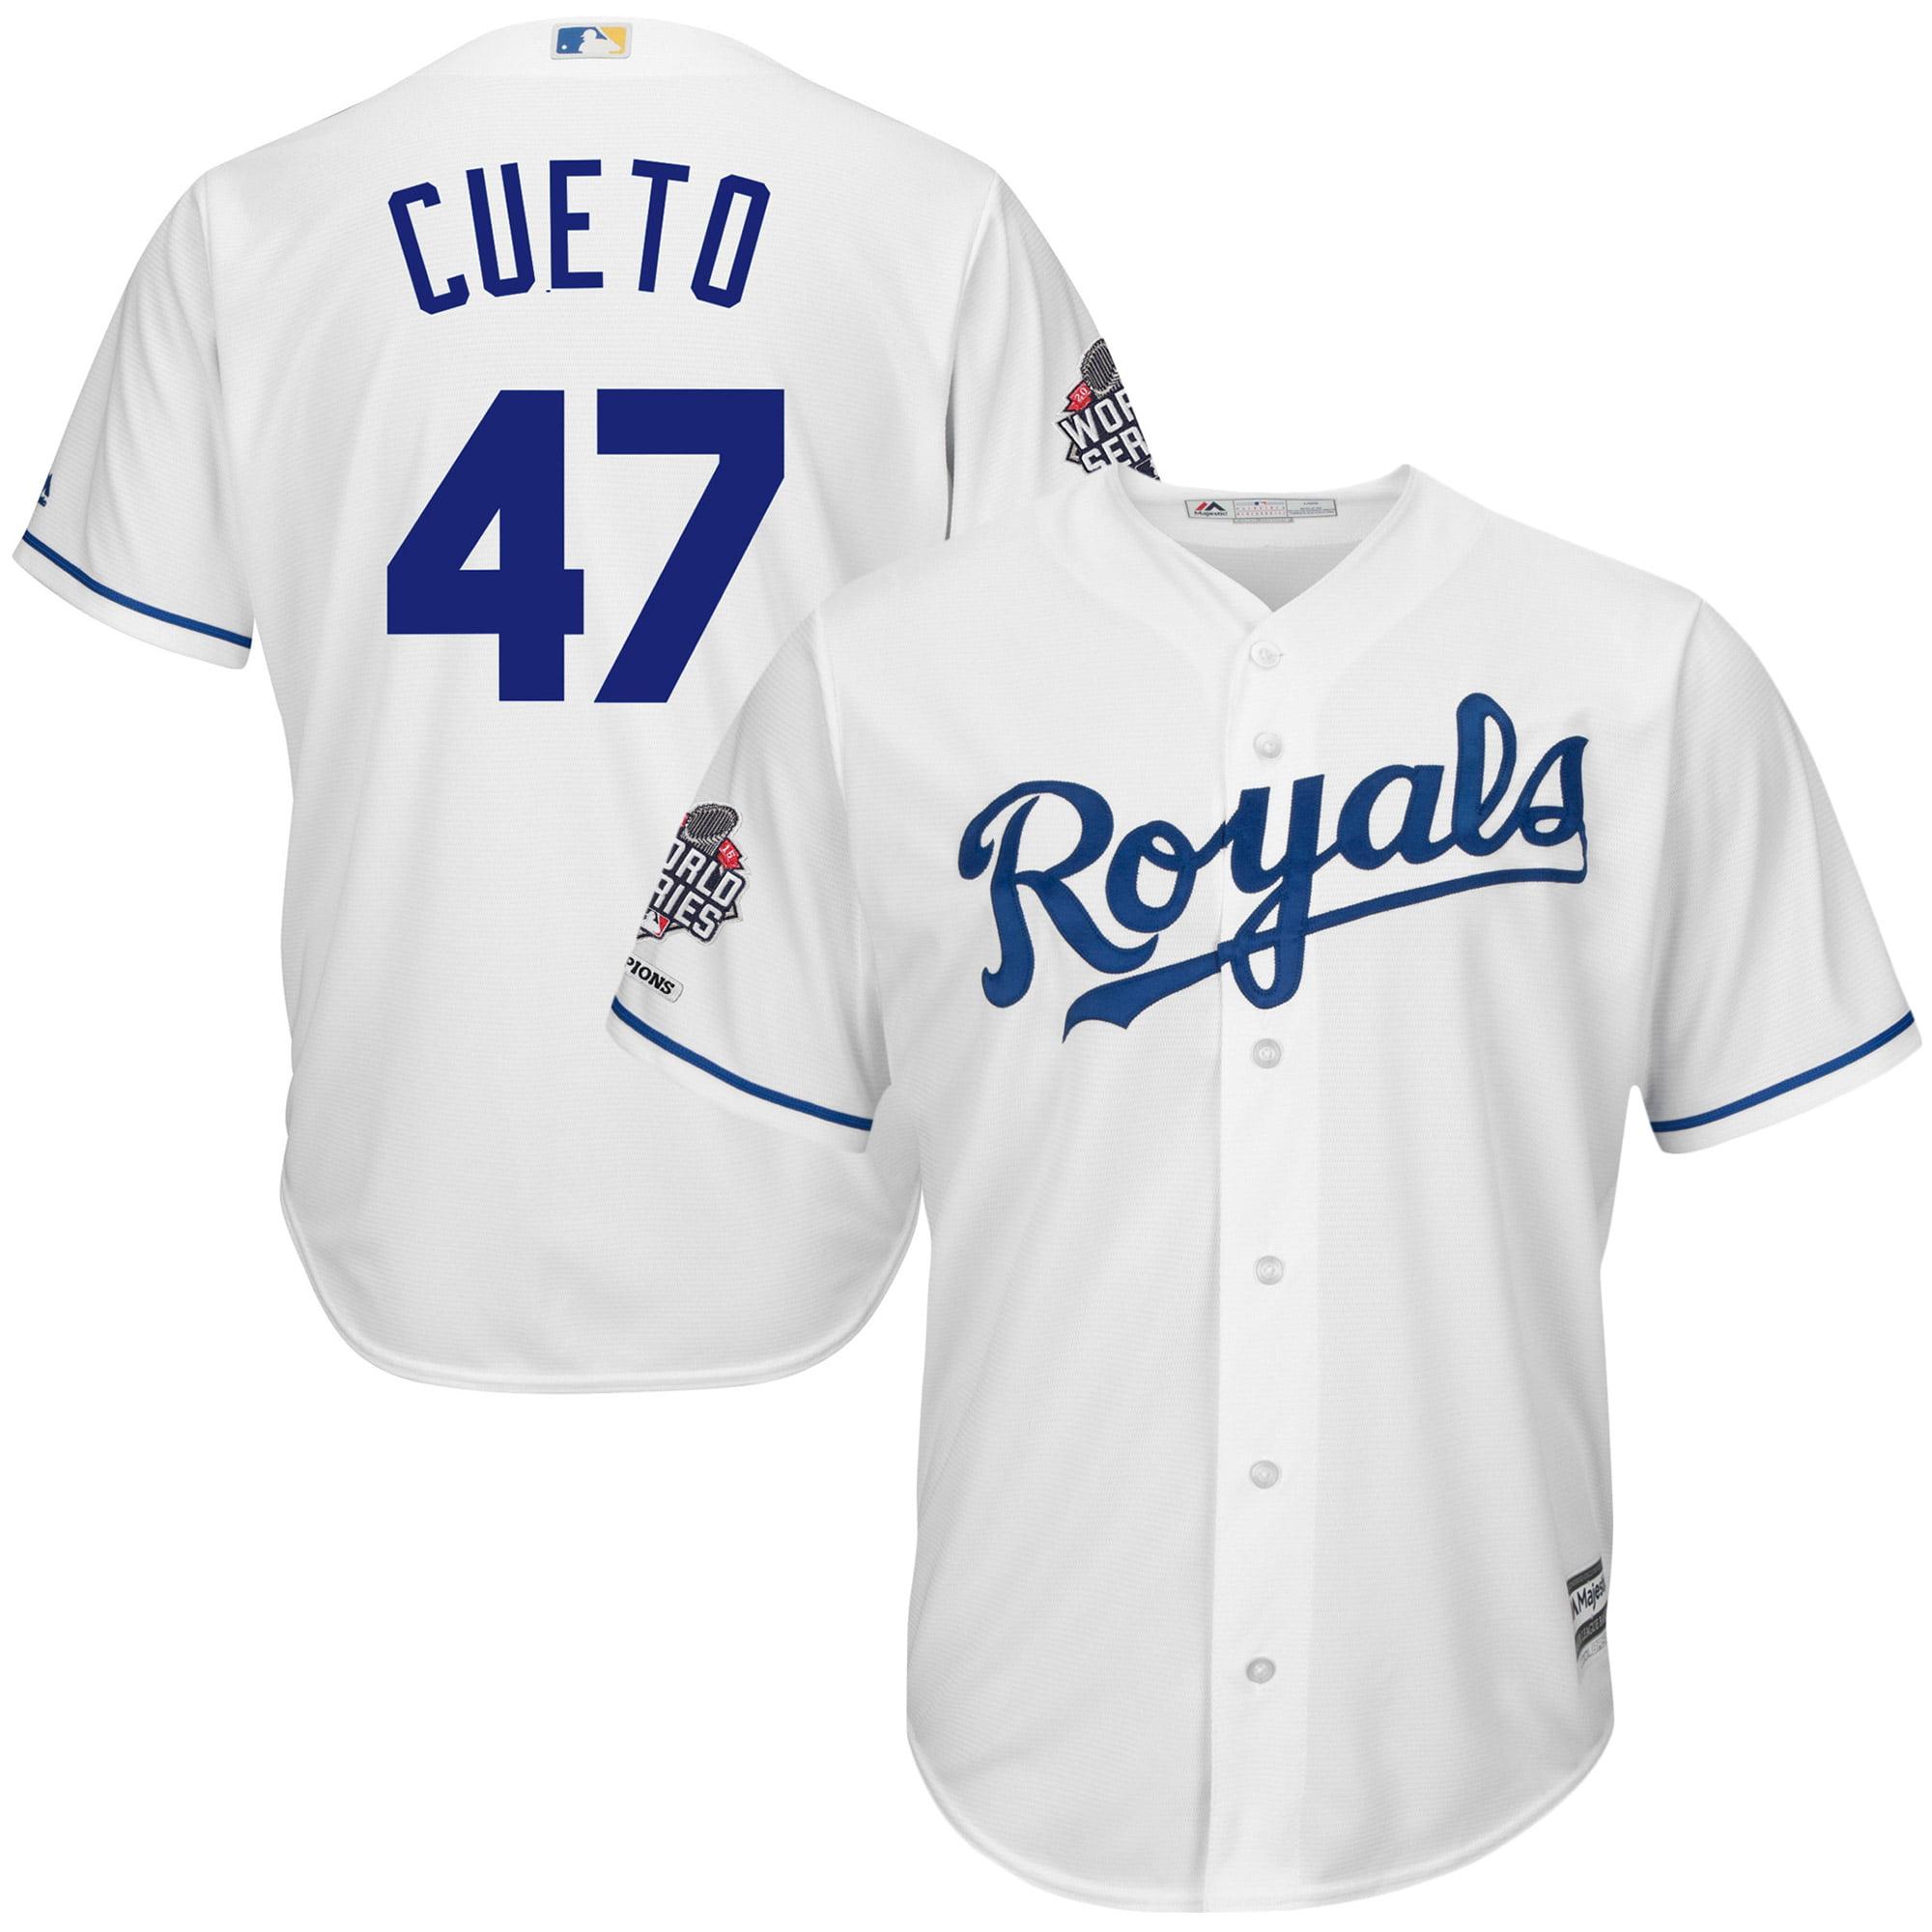 Johnny Cueto Kansas City Royals Majestic 2015 World Series Champions Cool Base Player Jersey - White